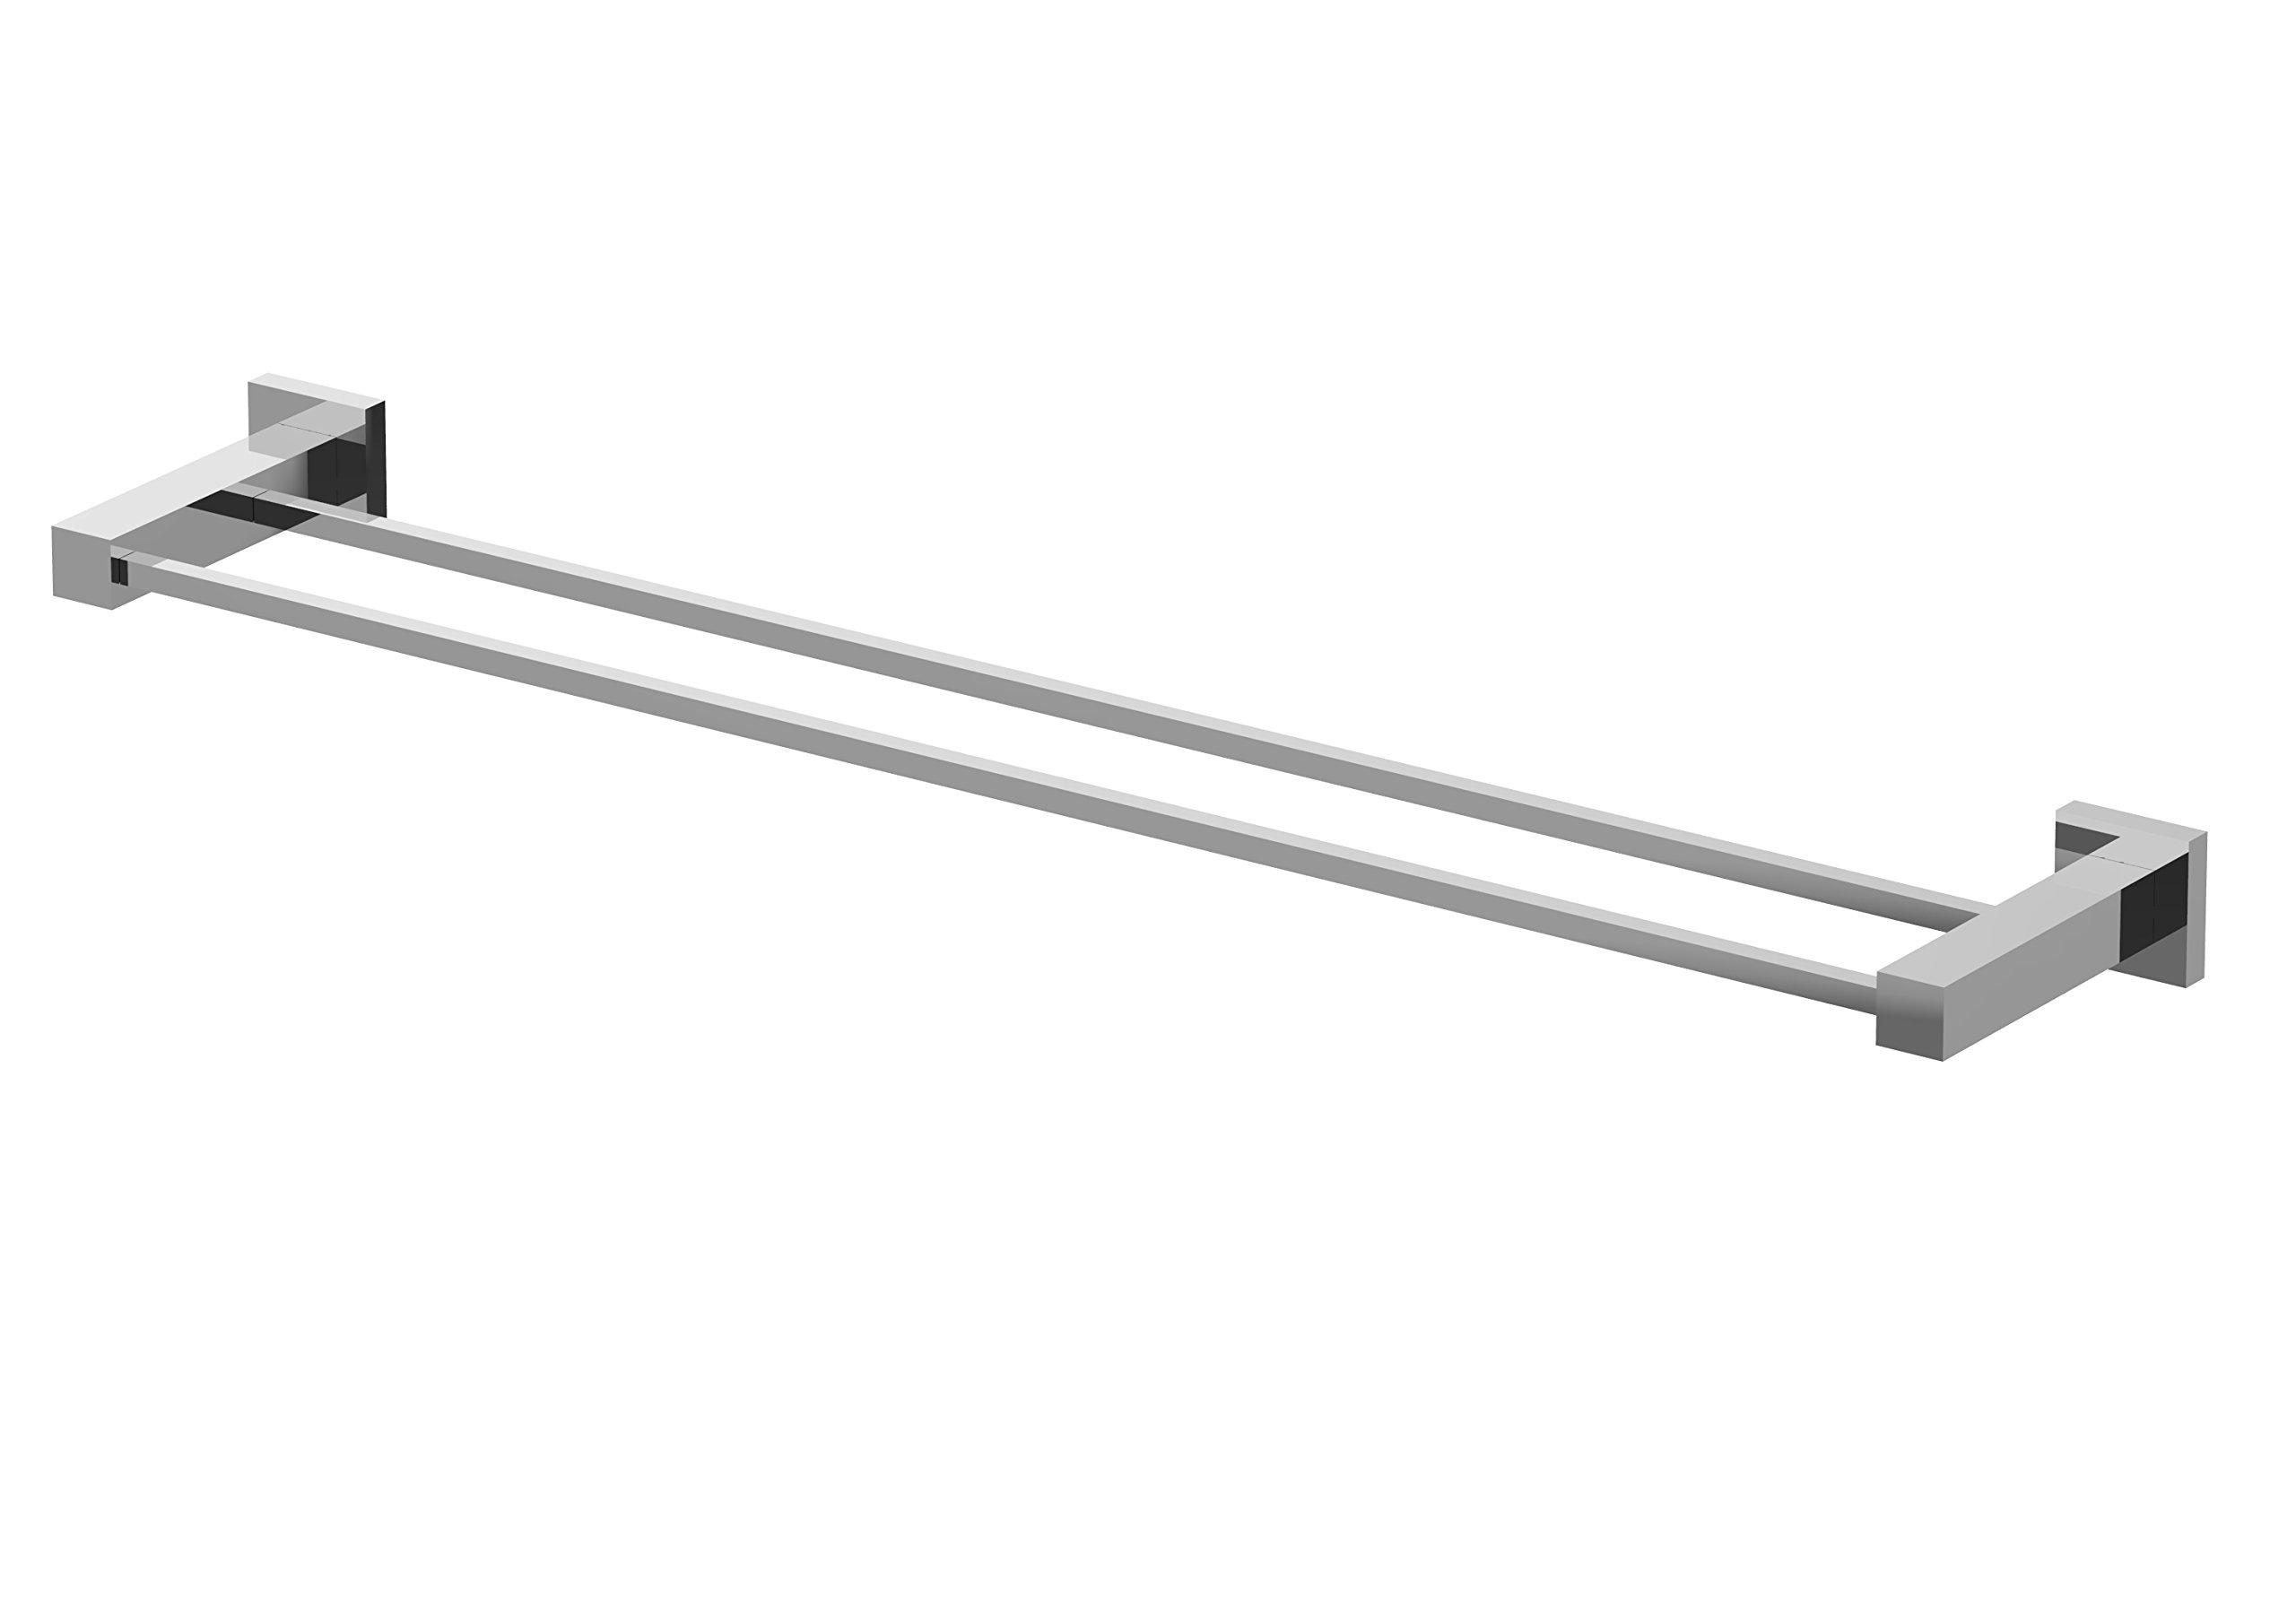 Eviva EVAC22BN Twin Toweller Towel bar Bathroom Accessories Combination, Brushed Nickel